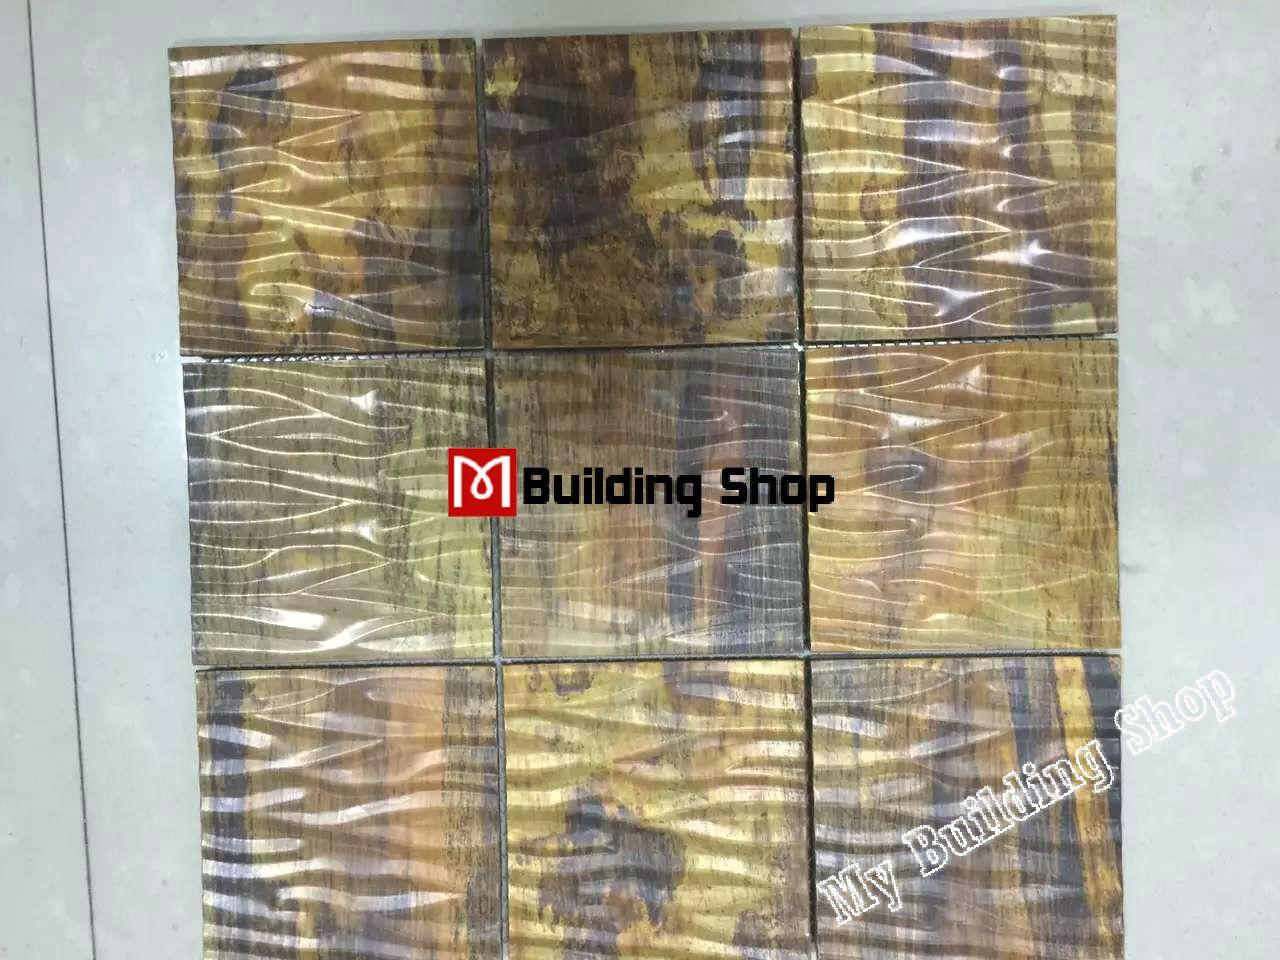 3d metal mosaic wall tile backsplash smmt071 copper metallic 3d metal mosaic wall tile backsplash smmt071 copper metallic stainless steel tiles 3d mosaic tiles bathroom dailygadgetfo Choice Image